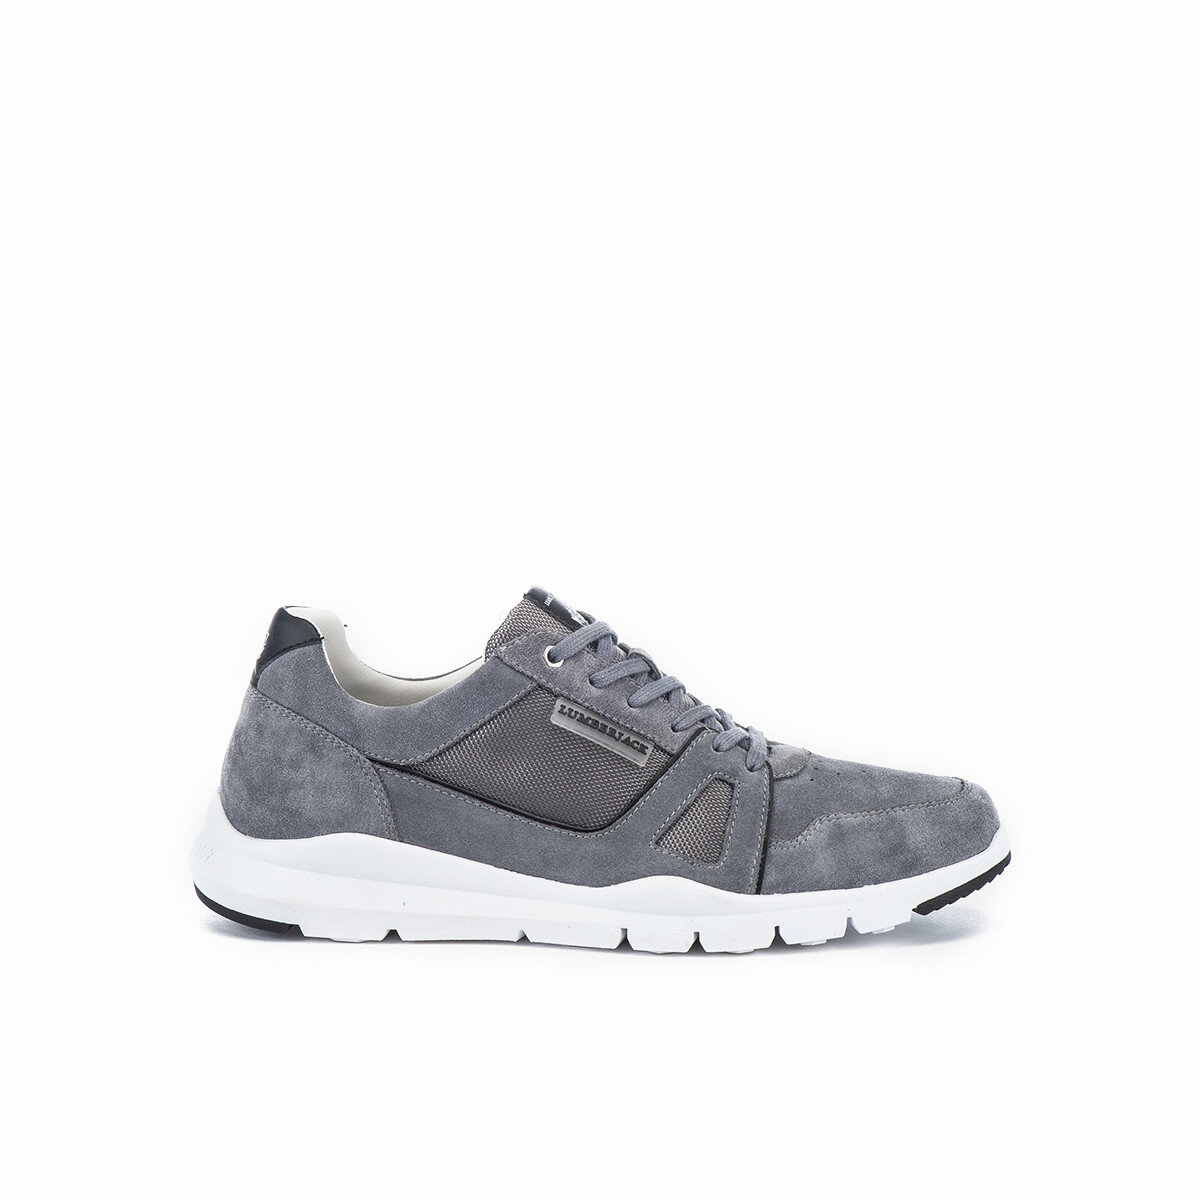 WADE Sneakers Uomo